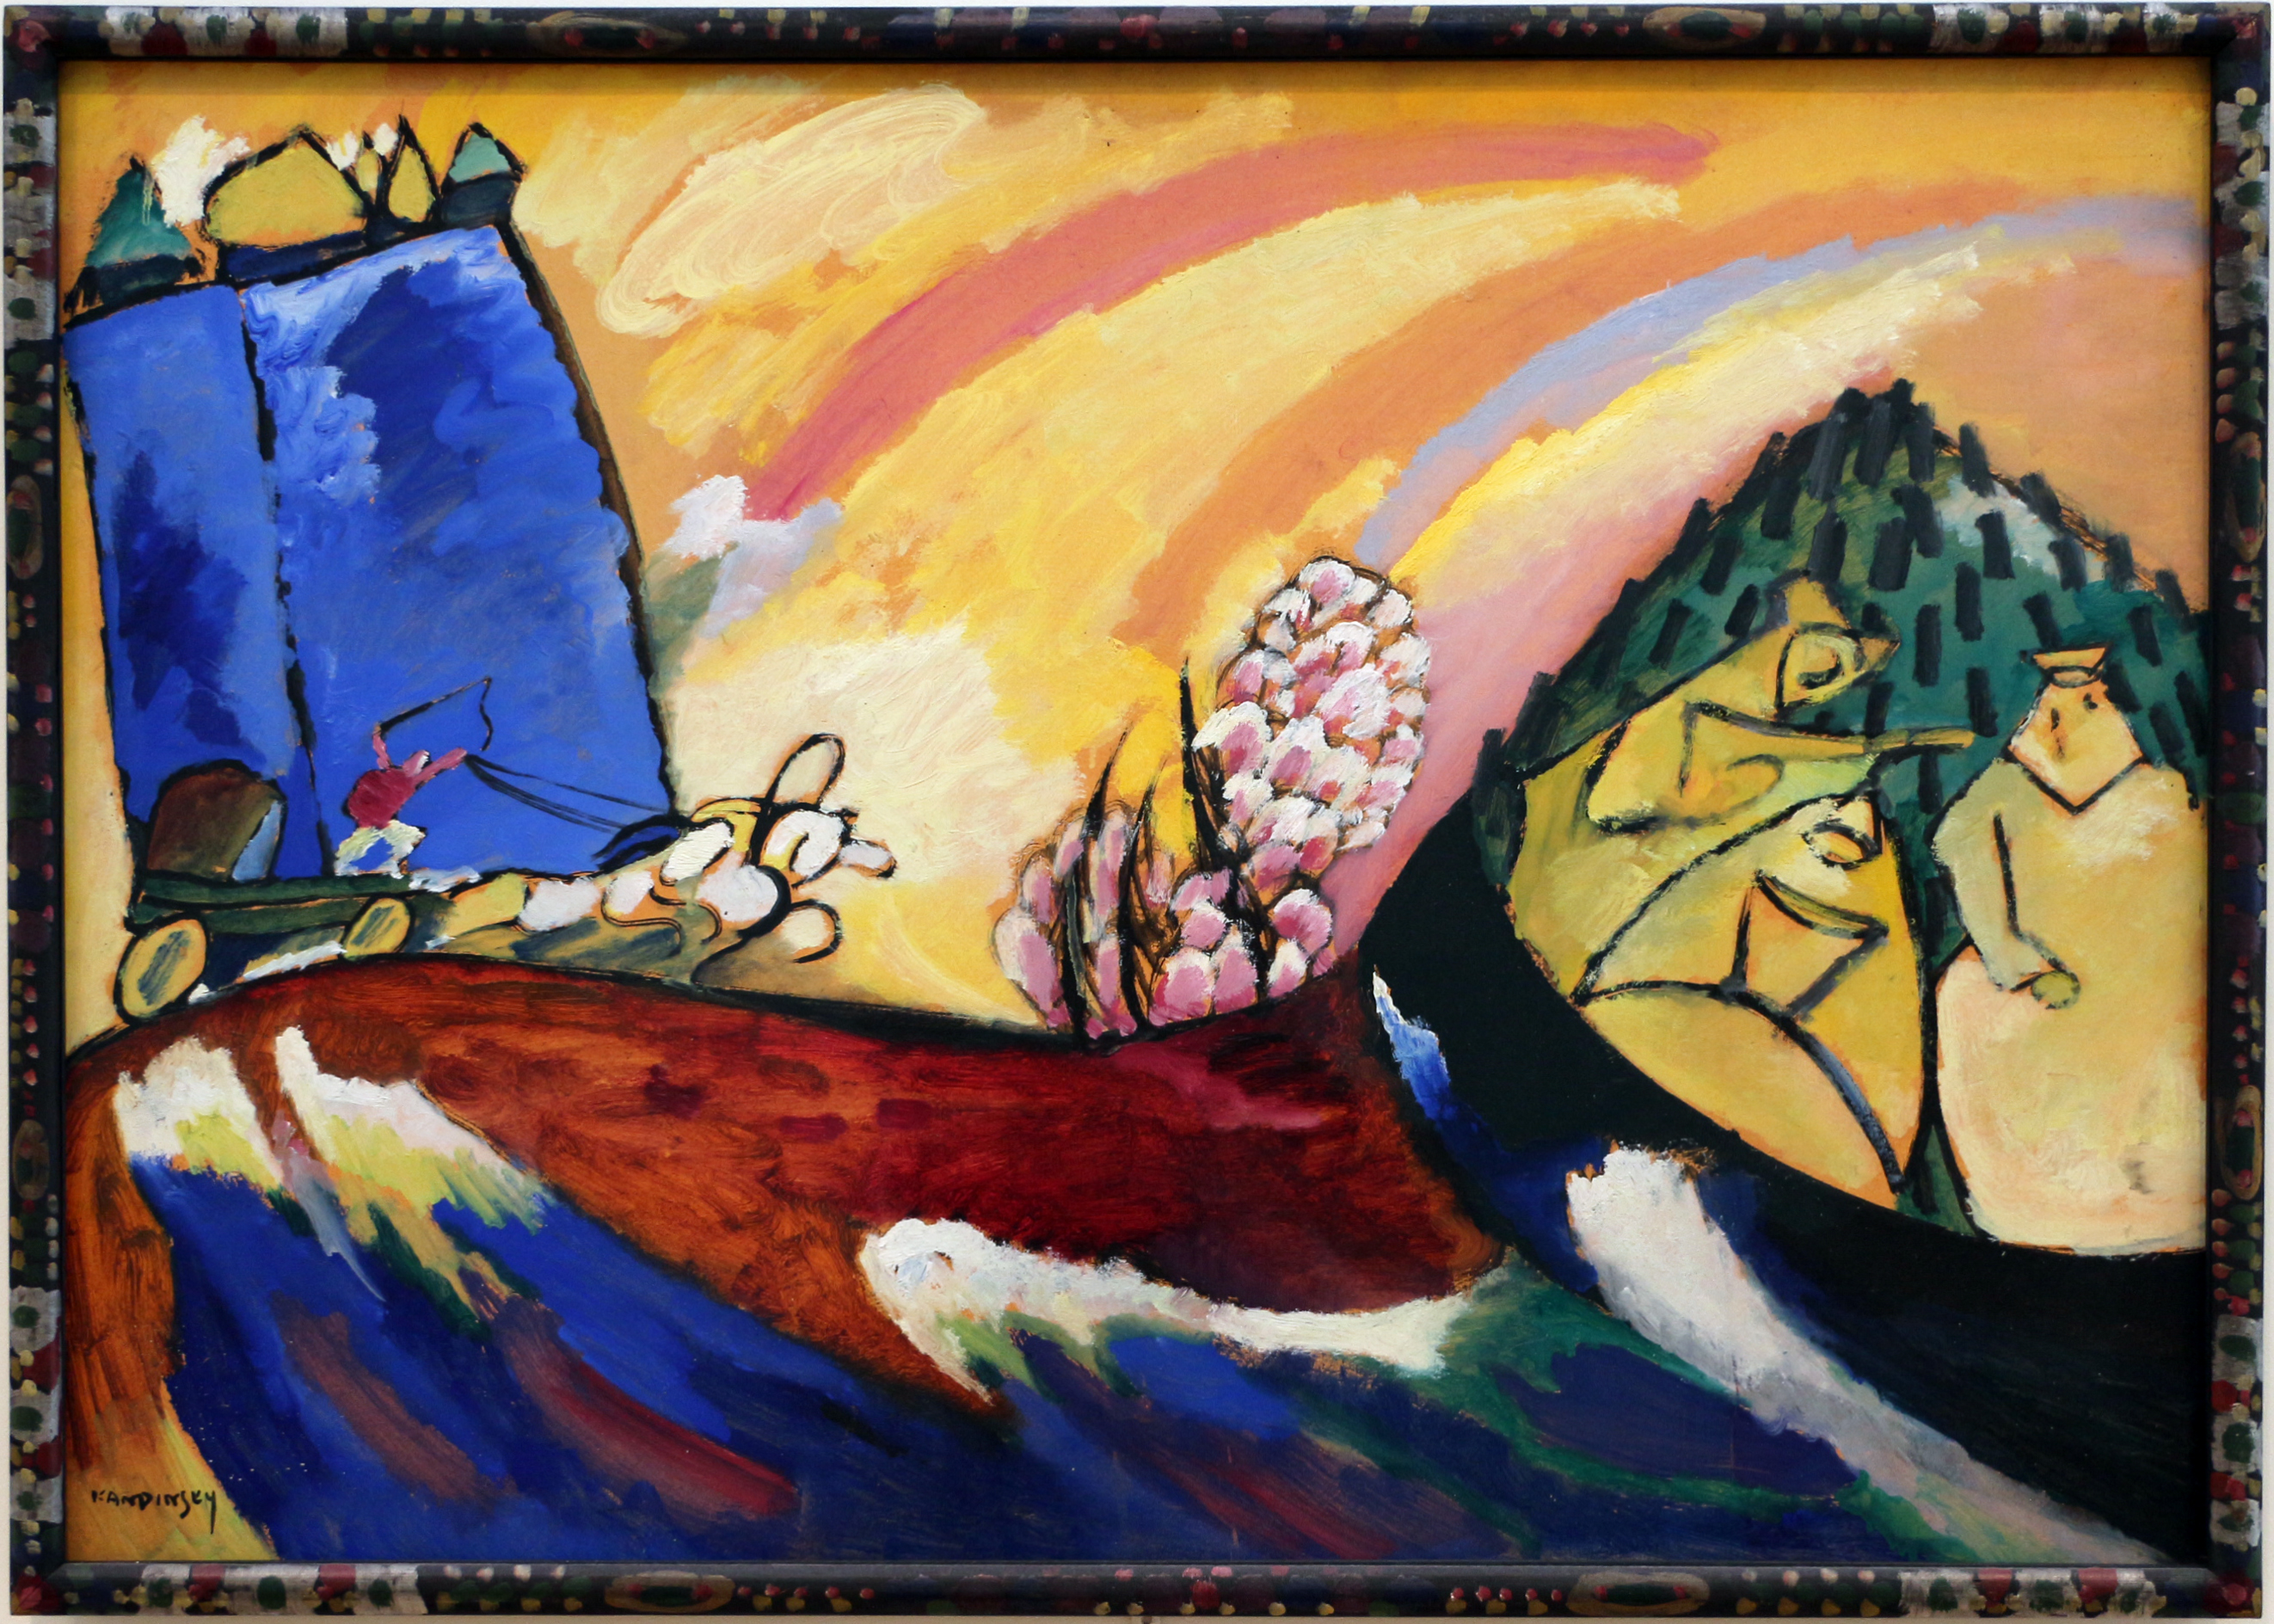 Lot - Wassily Kandinsky - Composition 1911 I